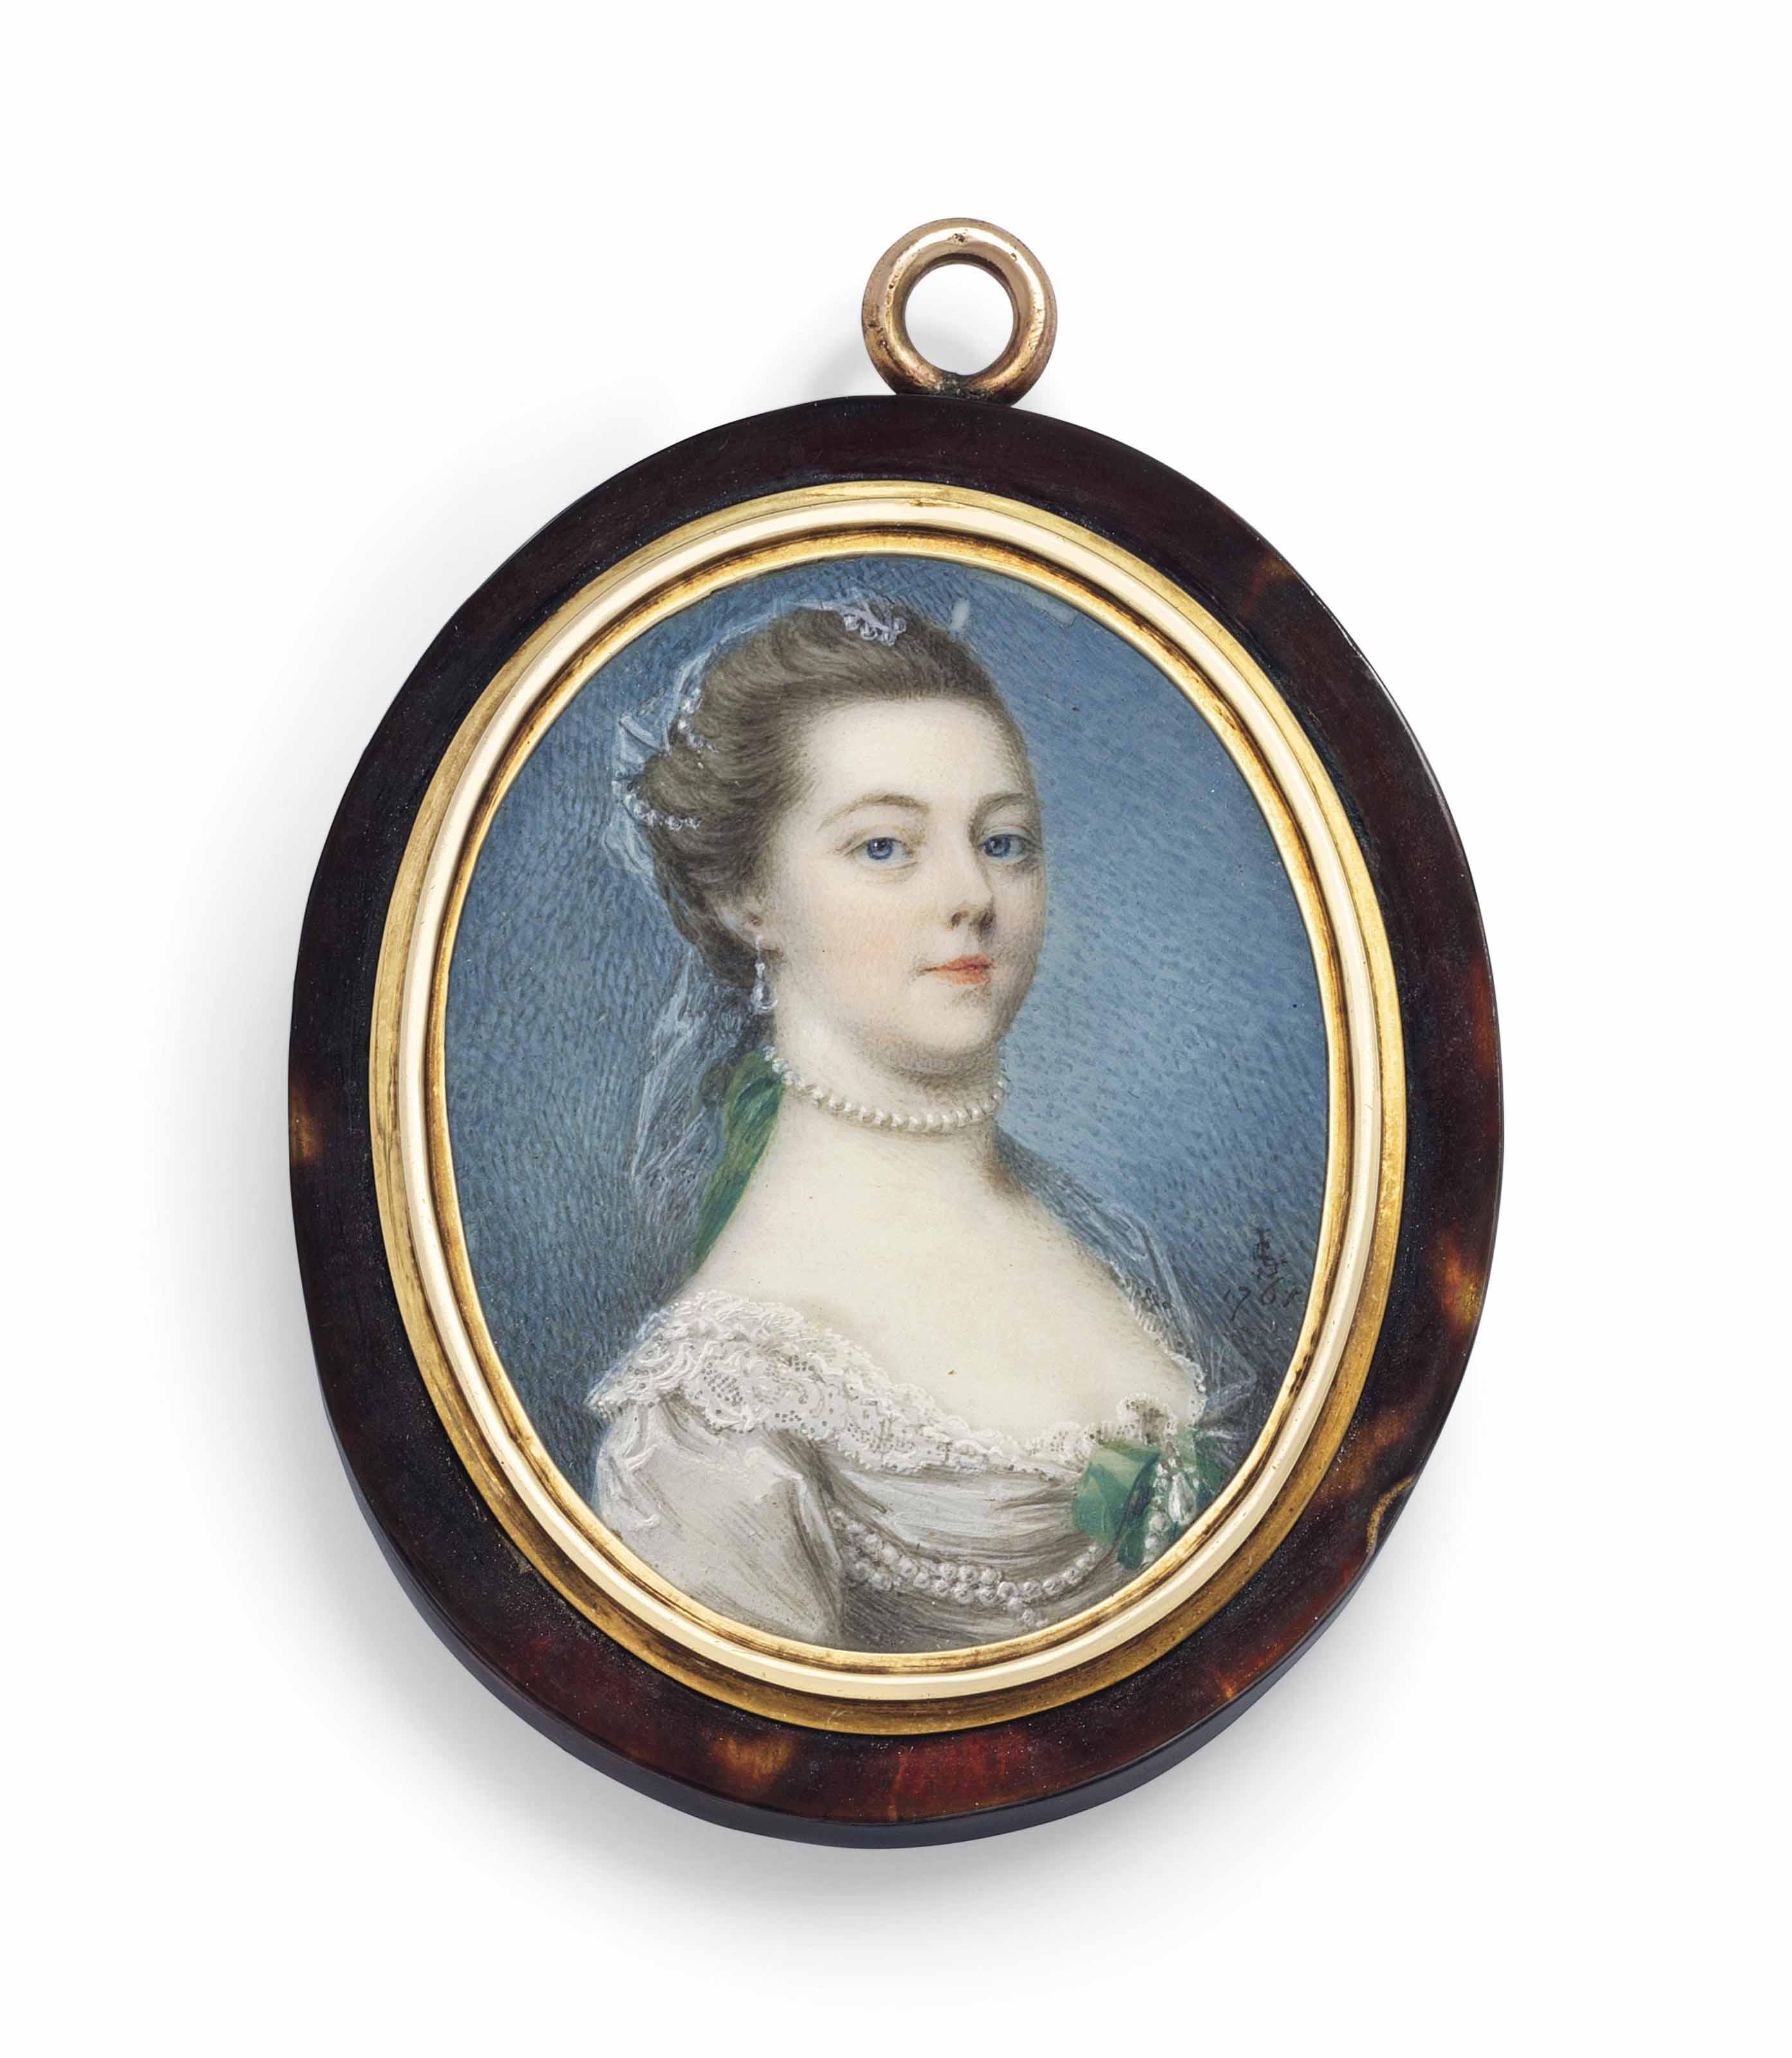 LUKE SULLIVAN (BRITISH, 1705-1